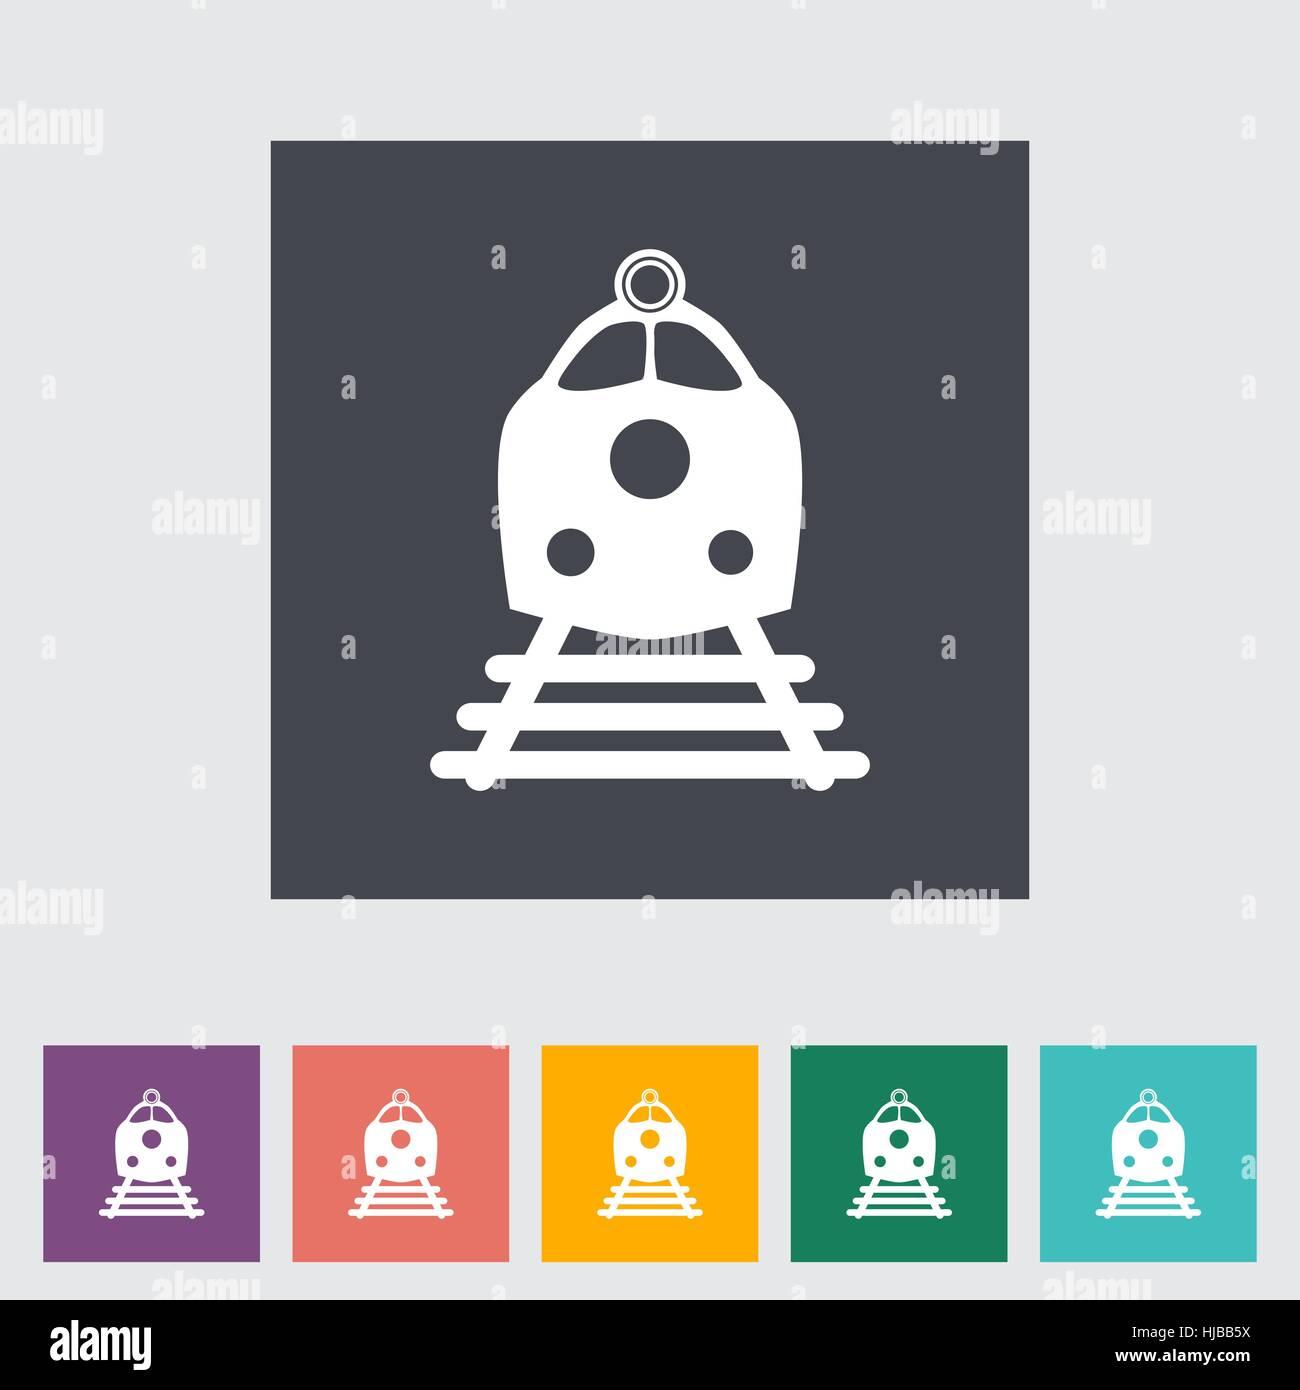 Train flat icon. Vector illustration EPS. - Stock Vector